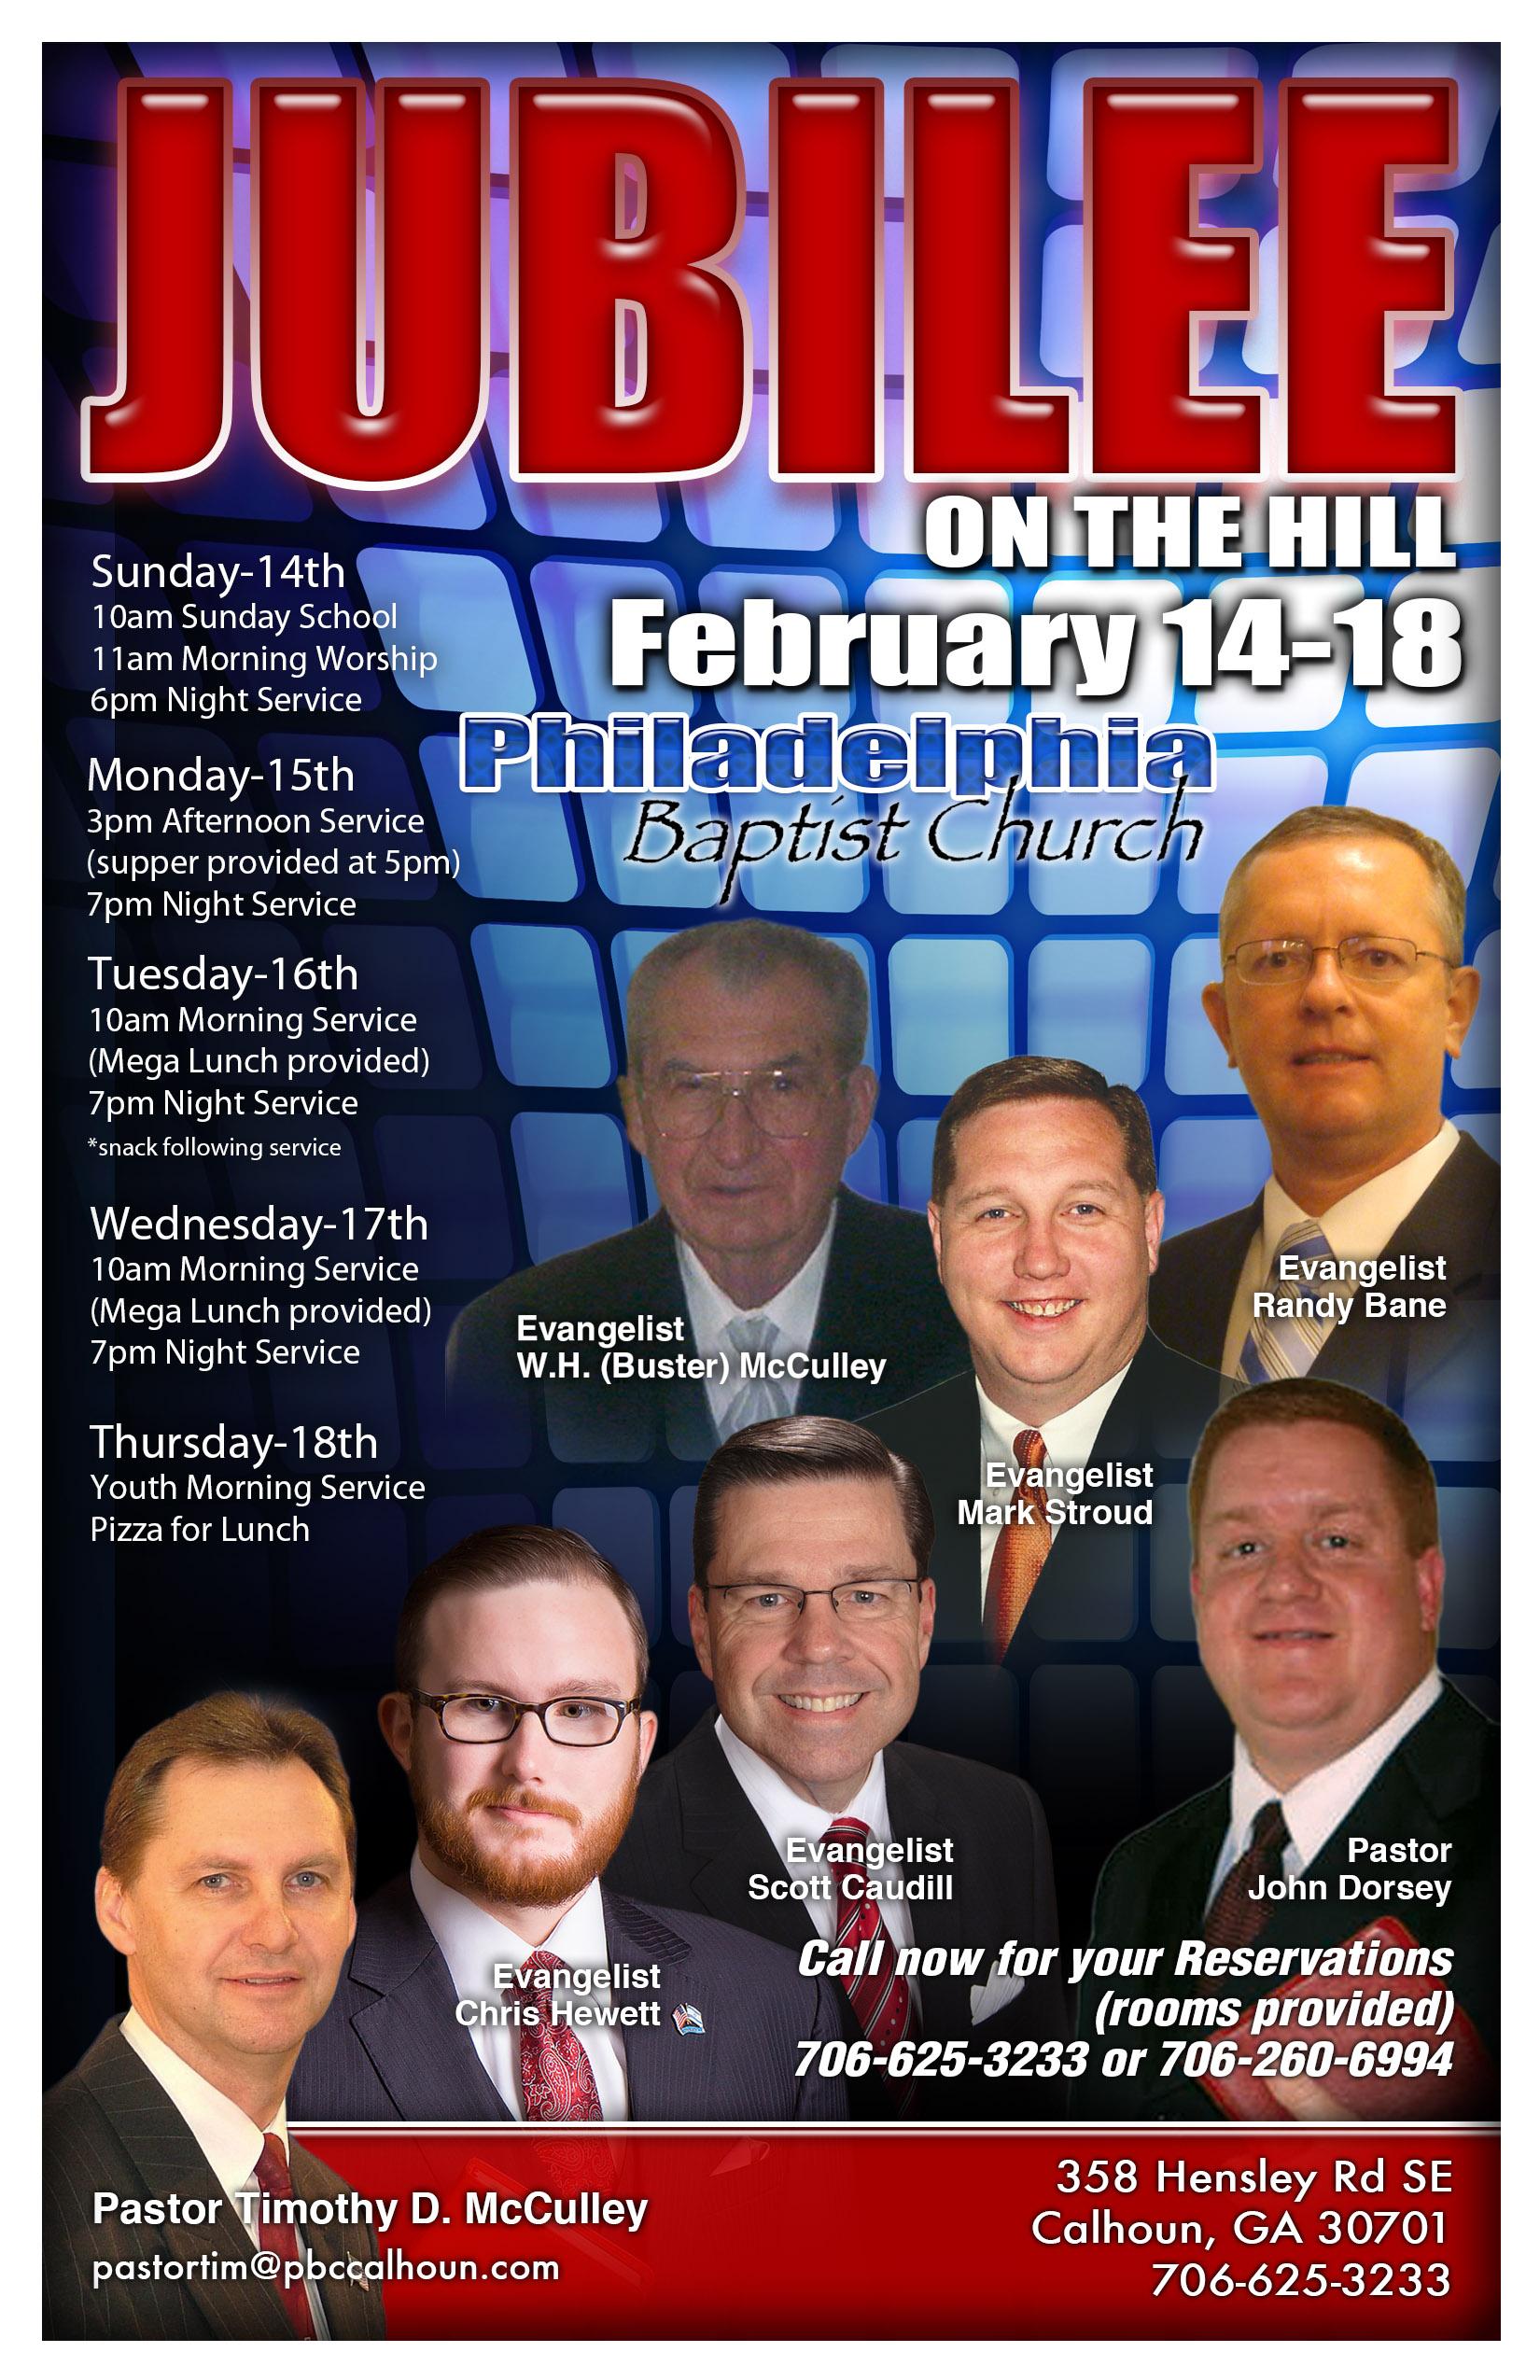 Area Meeting: Jubilee on the Hill – Philadelphia Baptist Church